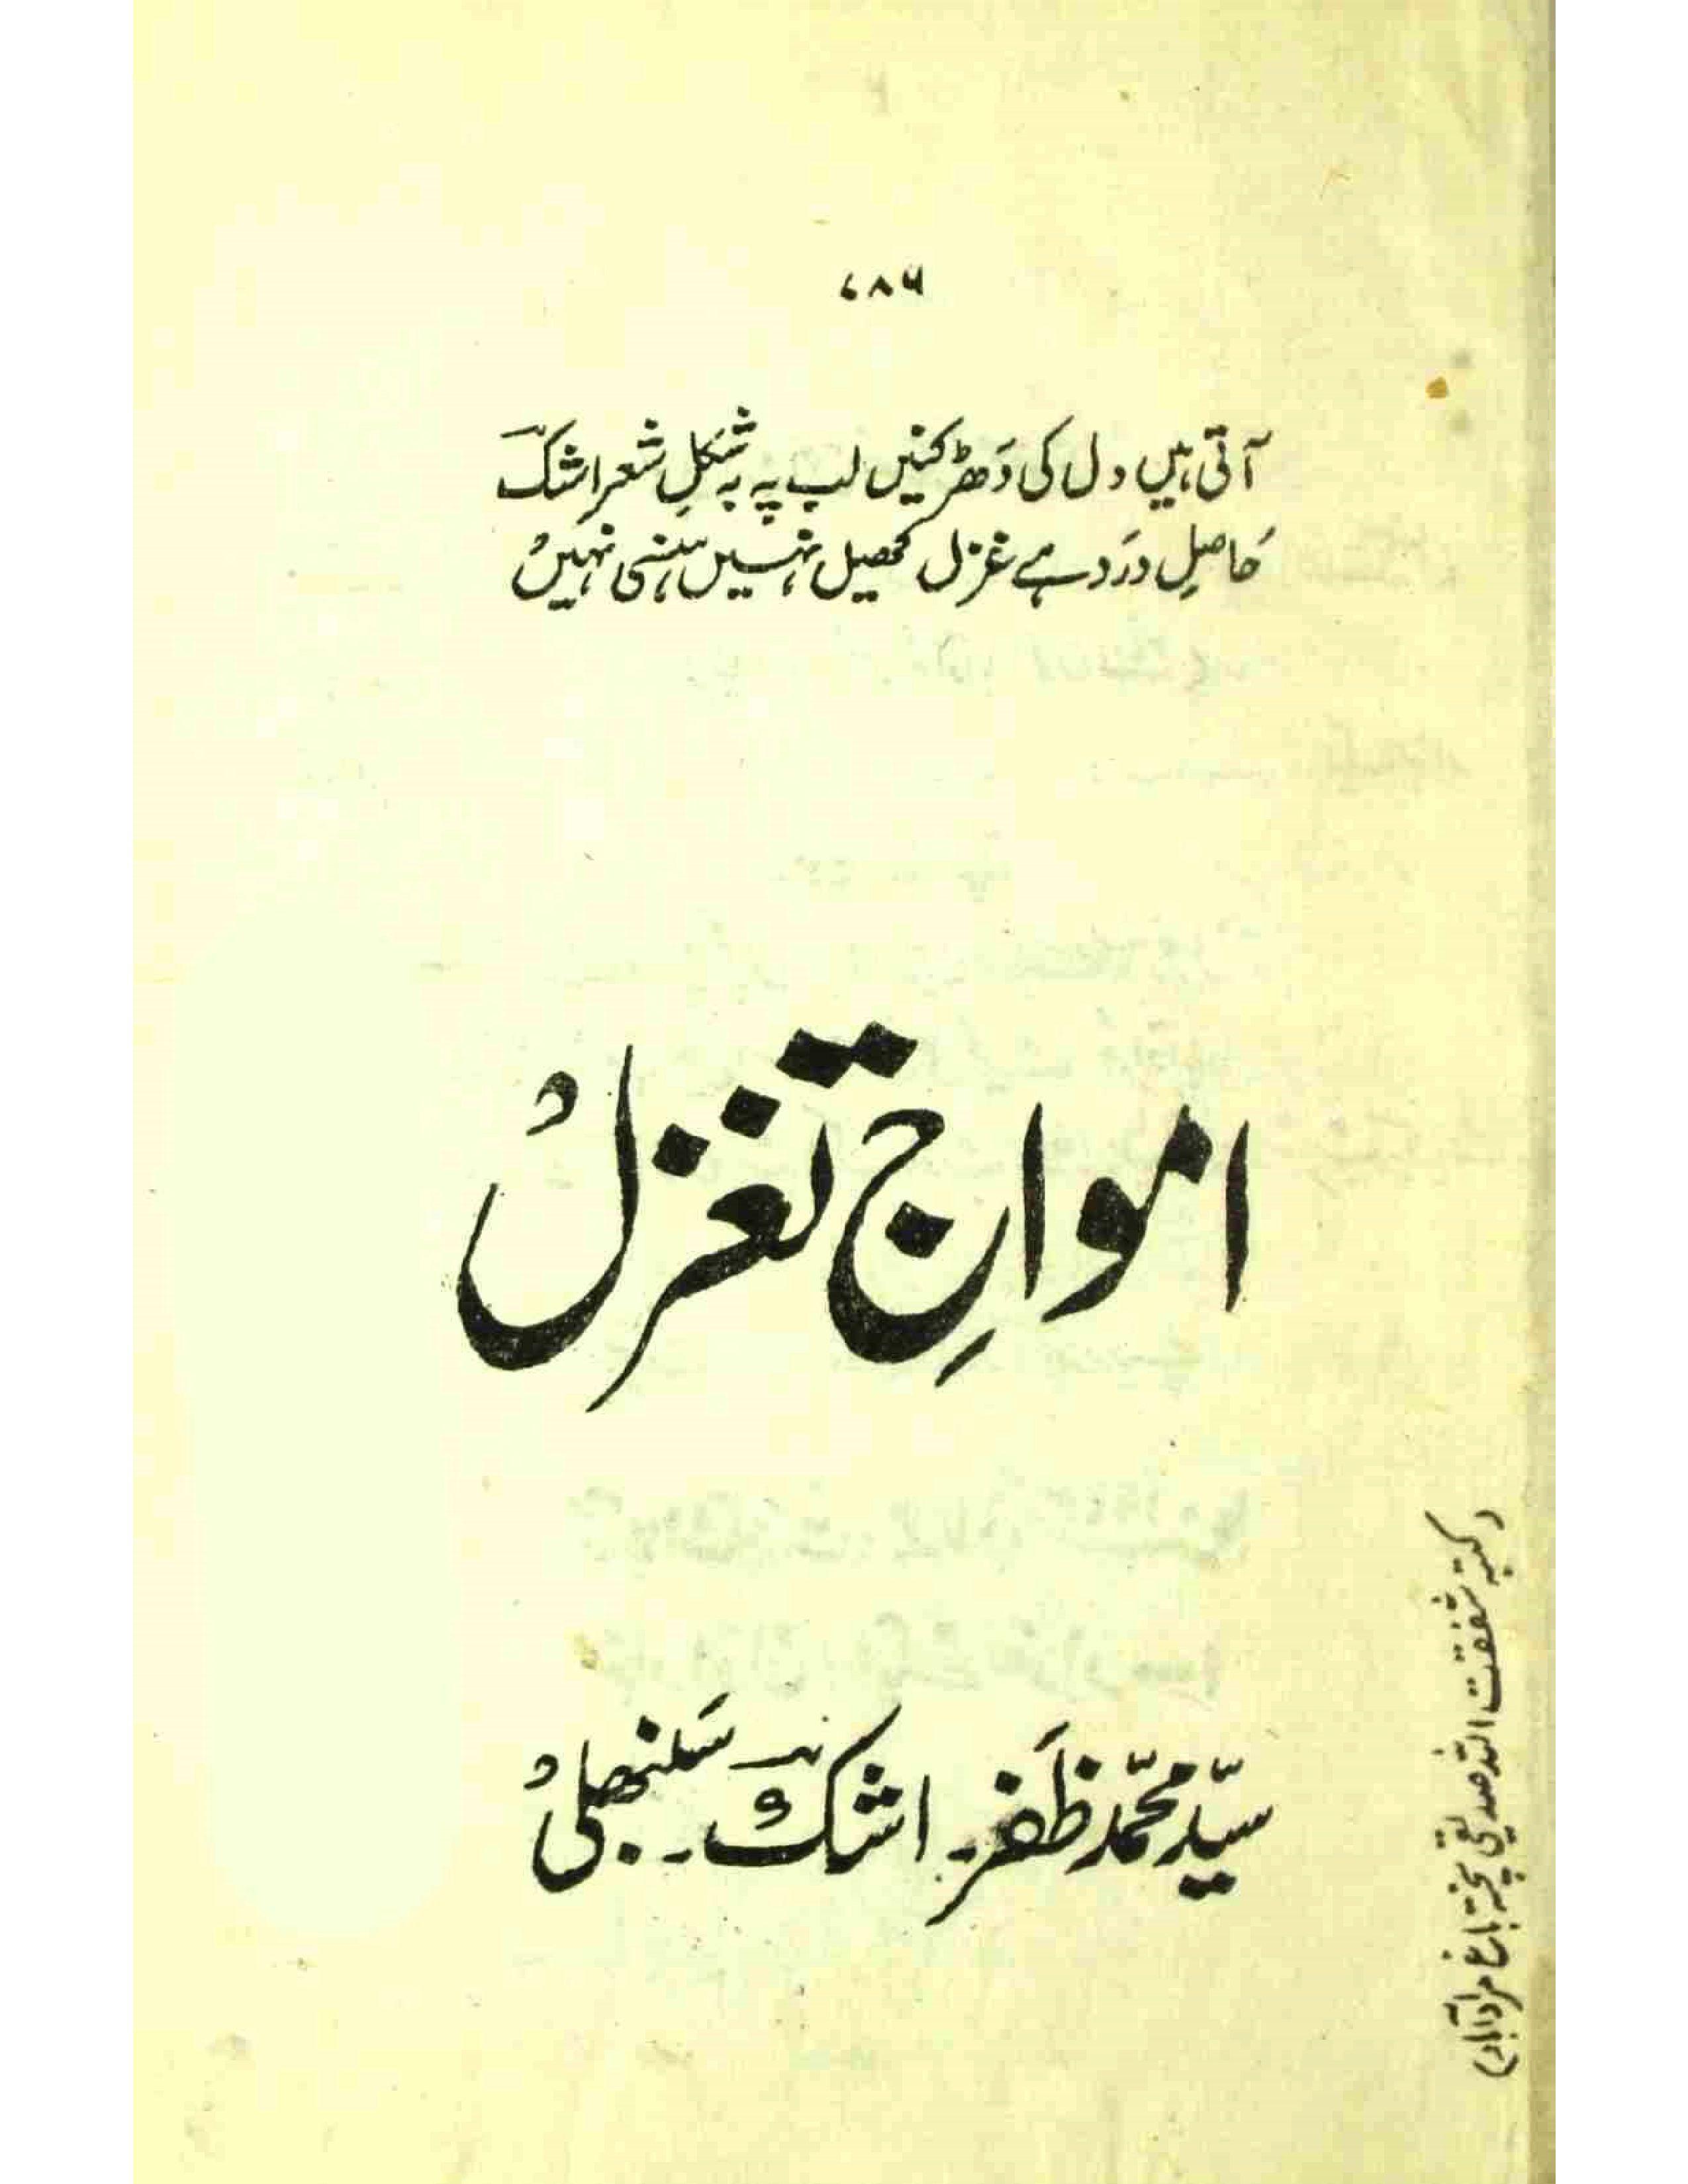 Amwaj-e-Taghazzul